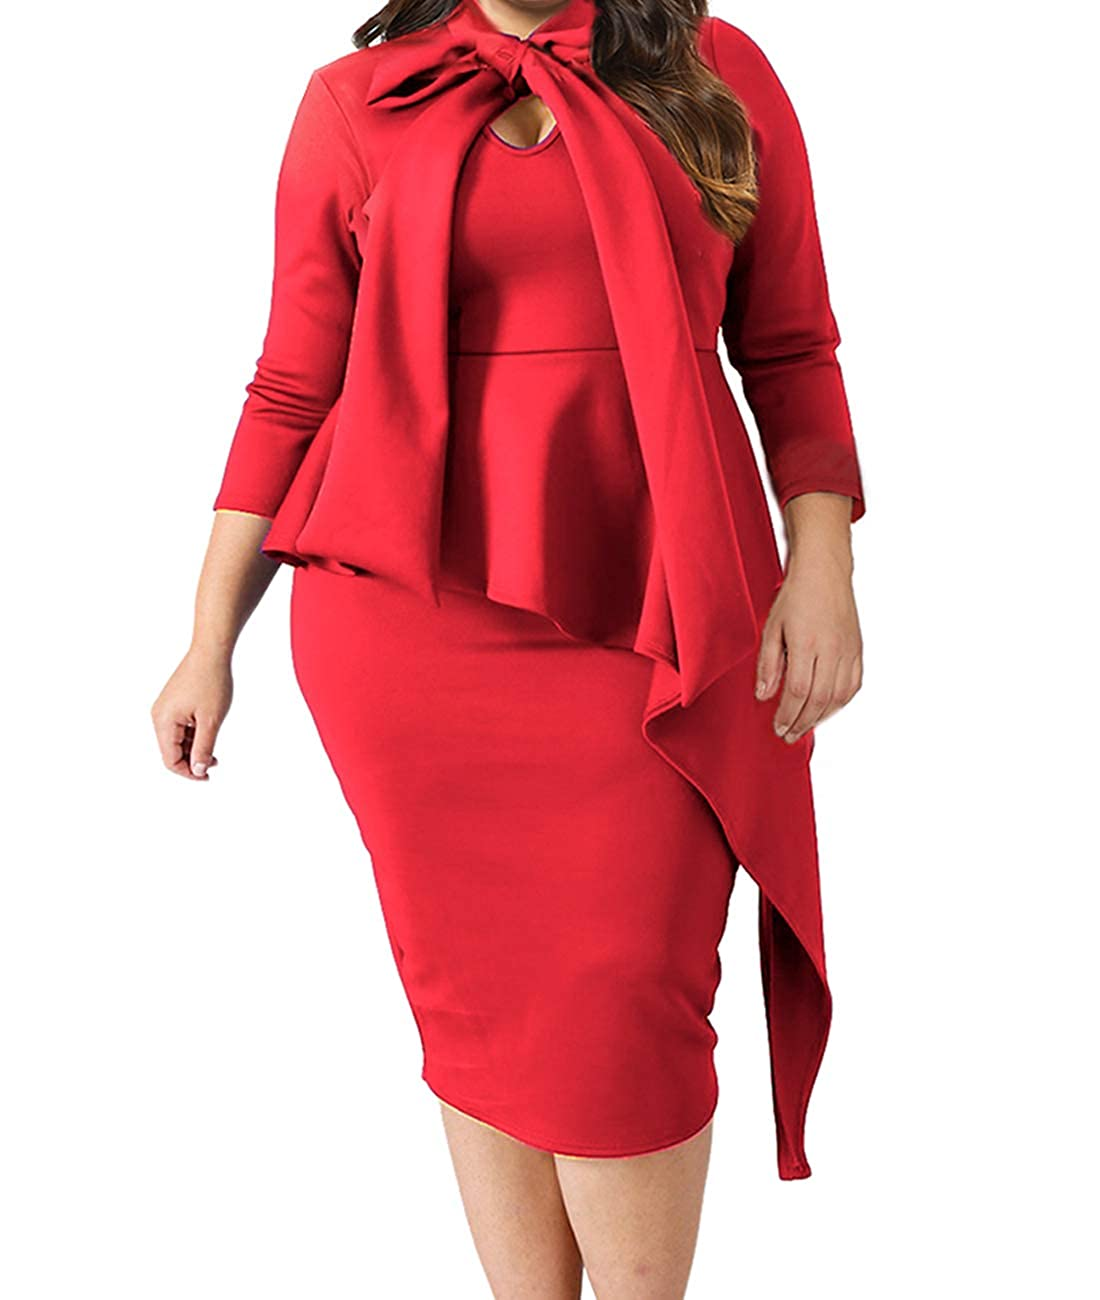 Lalagen Women's Plus Size Long Sleeve Peplum Tie Neck Bodycon Pencil Midi Dress LLGEA610372